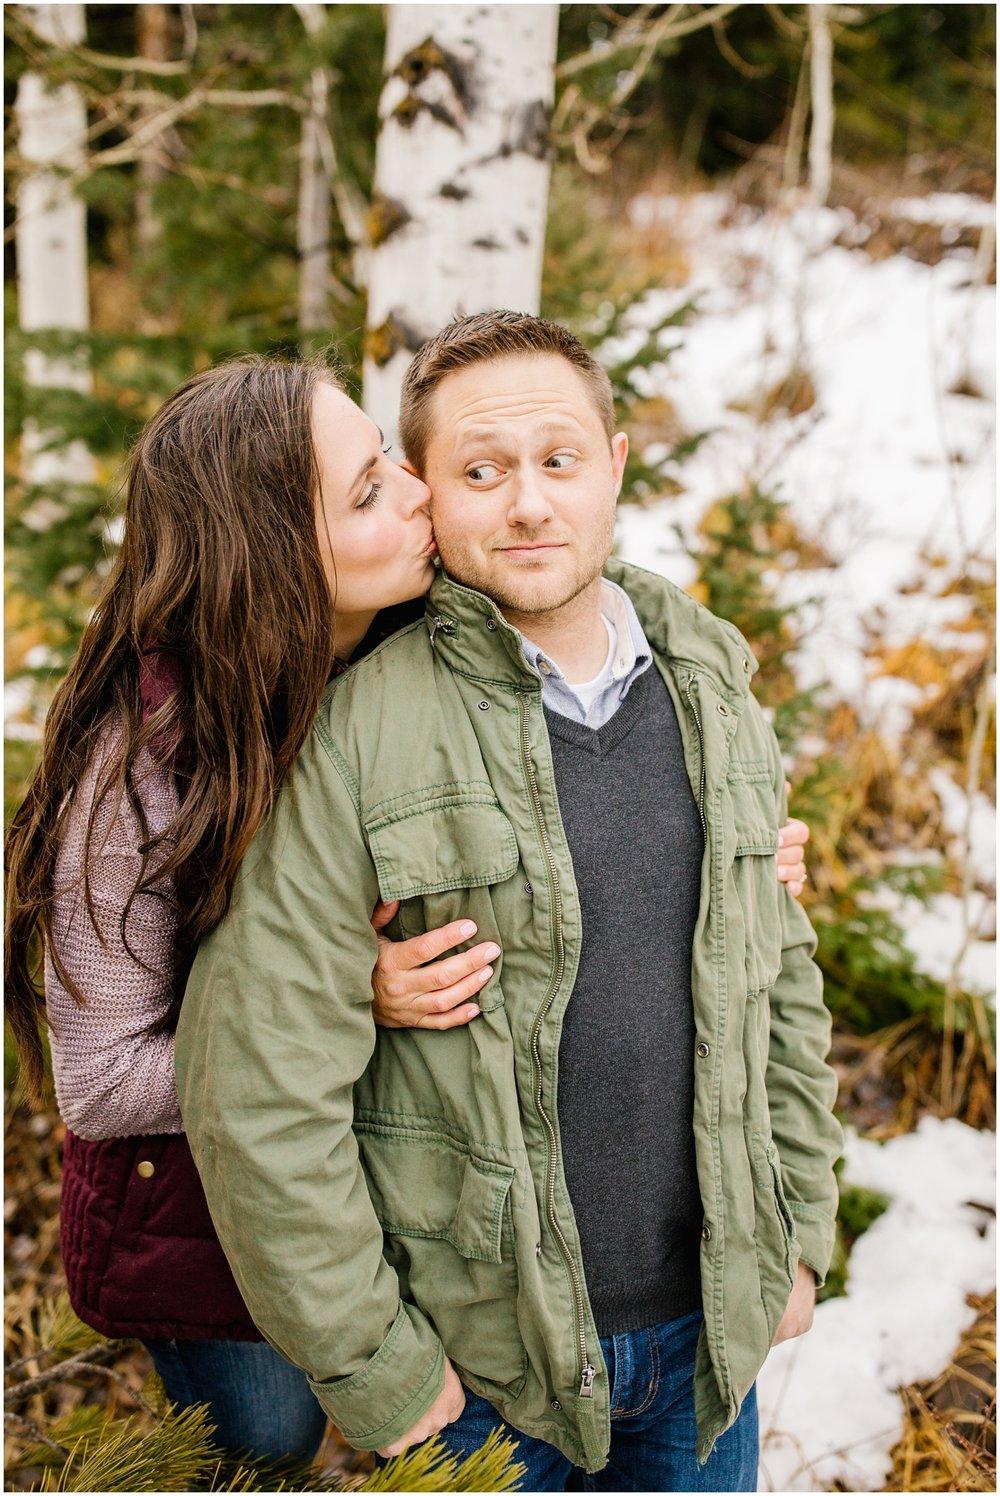 SSEngagements-59_Lizzie-B-Imagery-Utah-Wedding-Photographer-Park-City-Salt-Lake-City-Logan-Utah-Engagement-Session.jpg